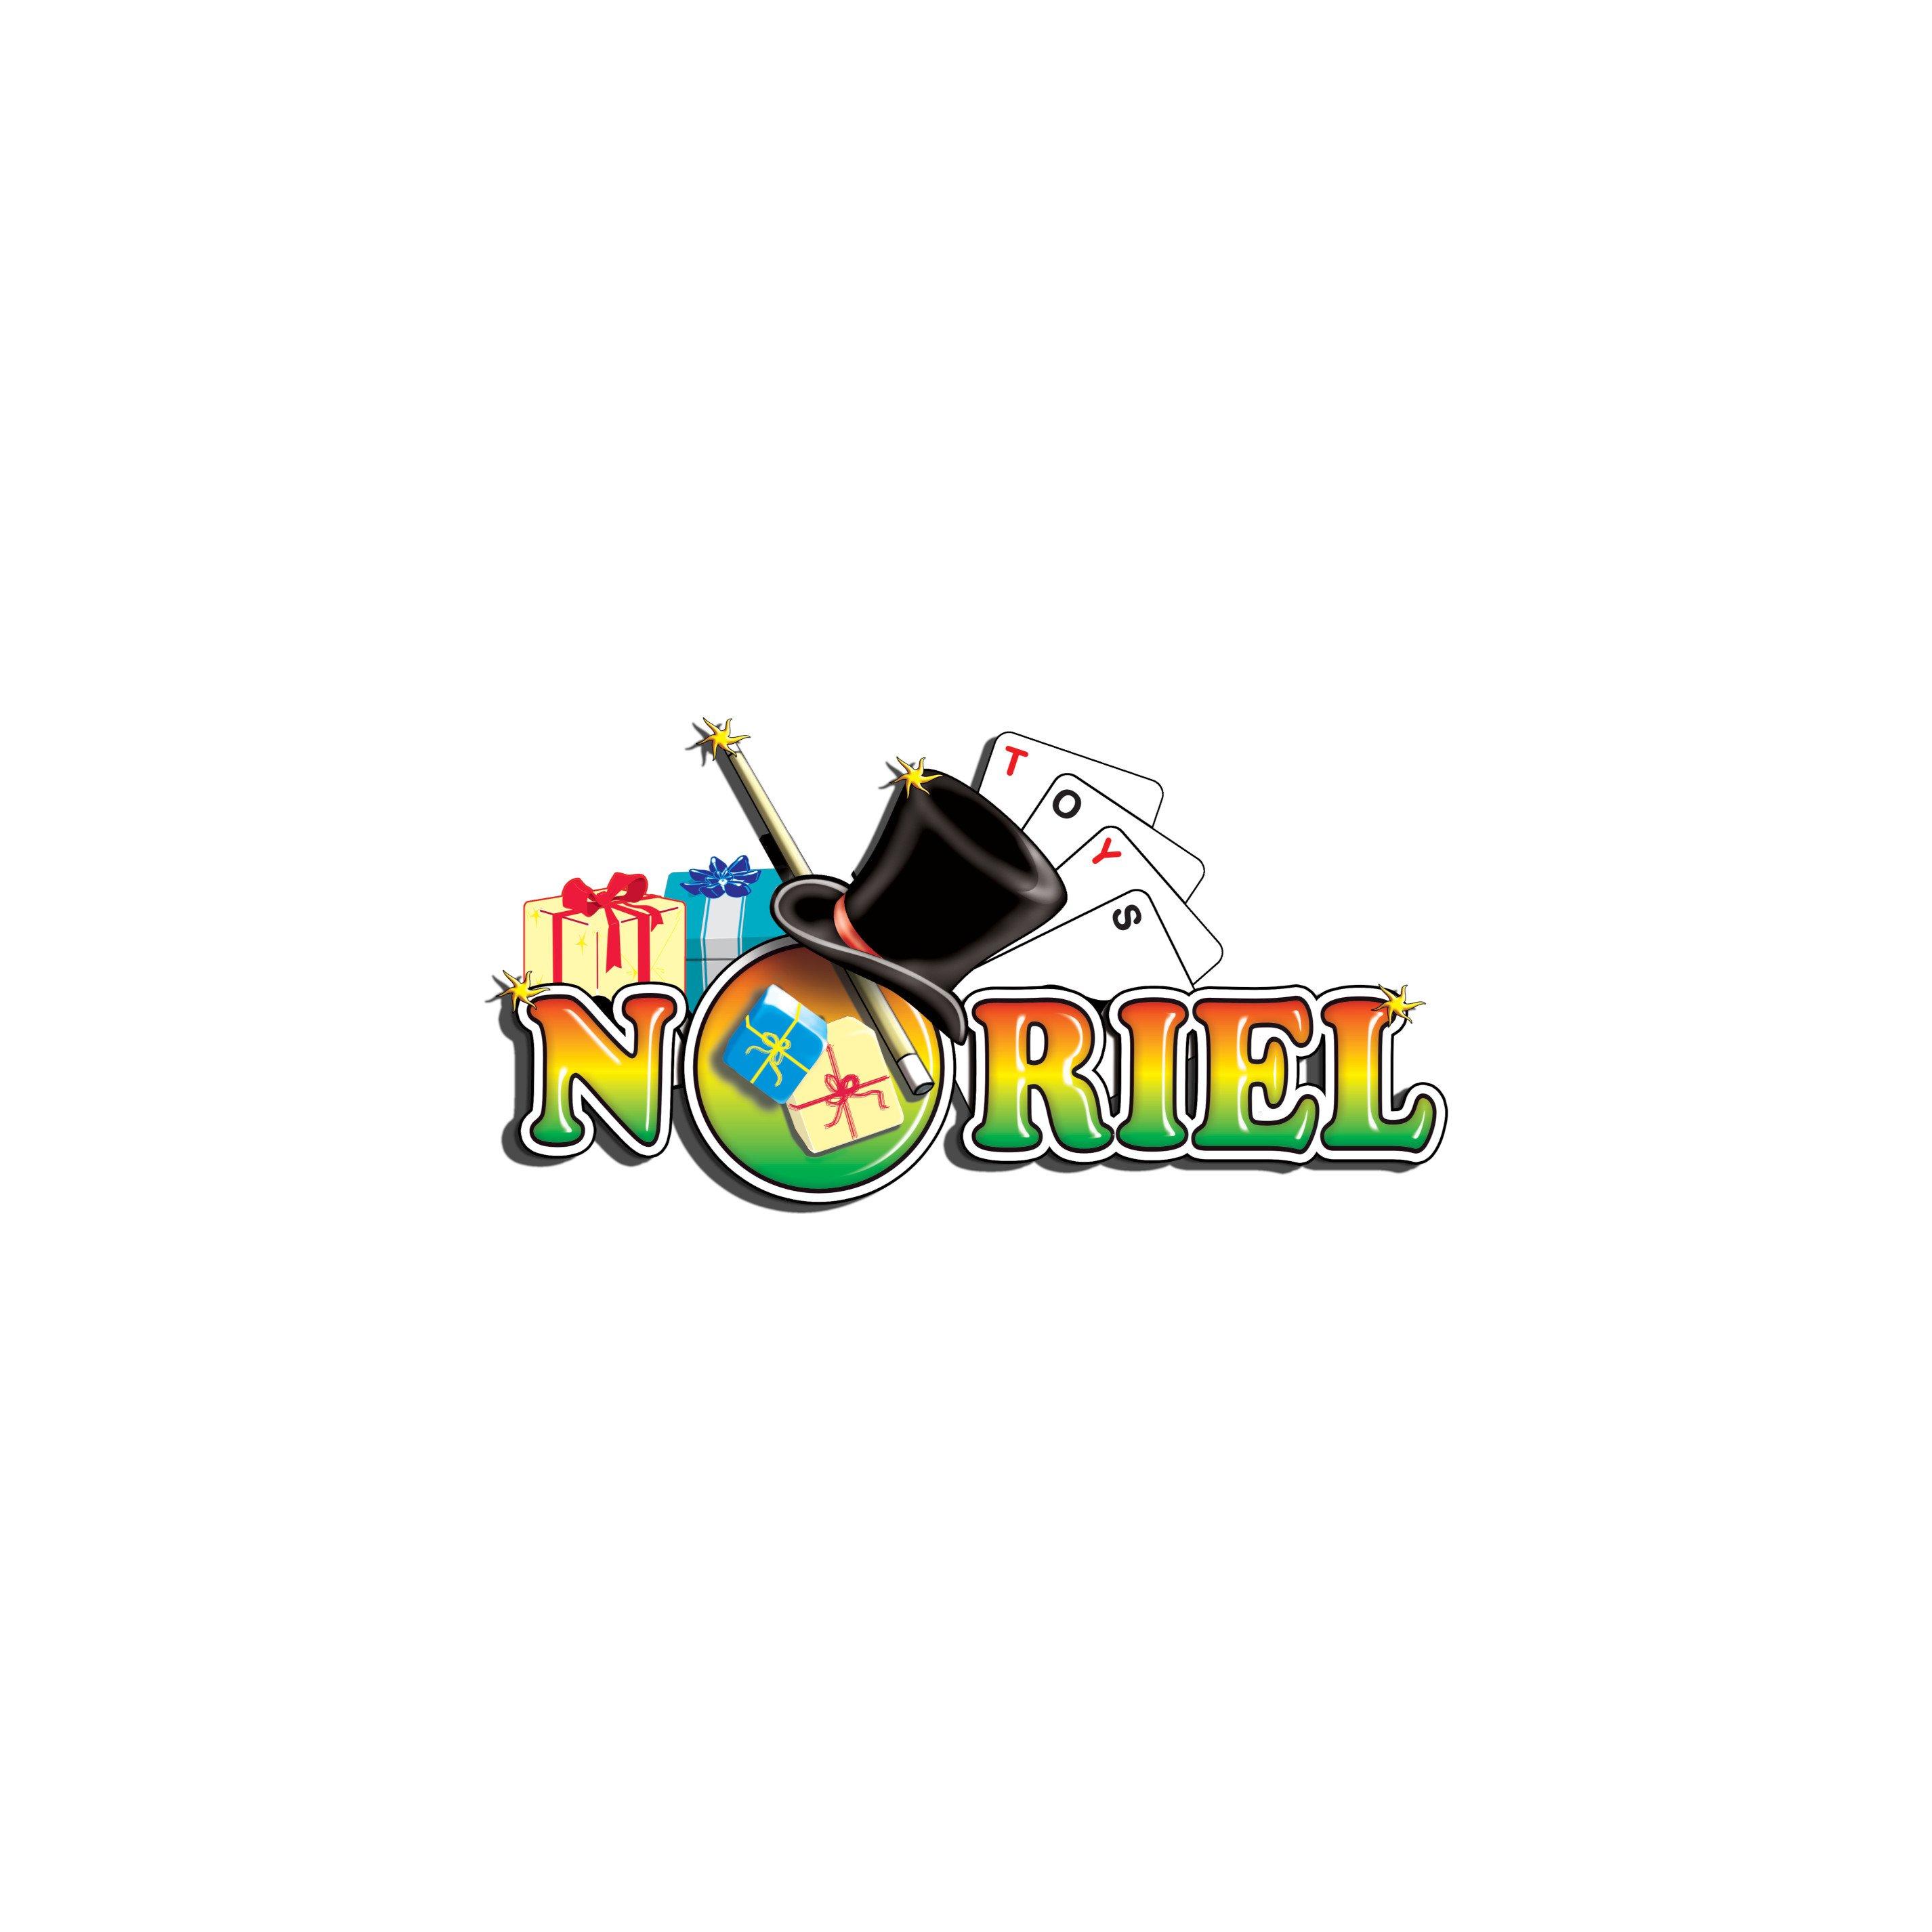 DK000562480_001w Set stickere Disney Frozen 2, 10 x 22 cm